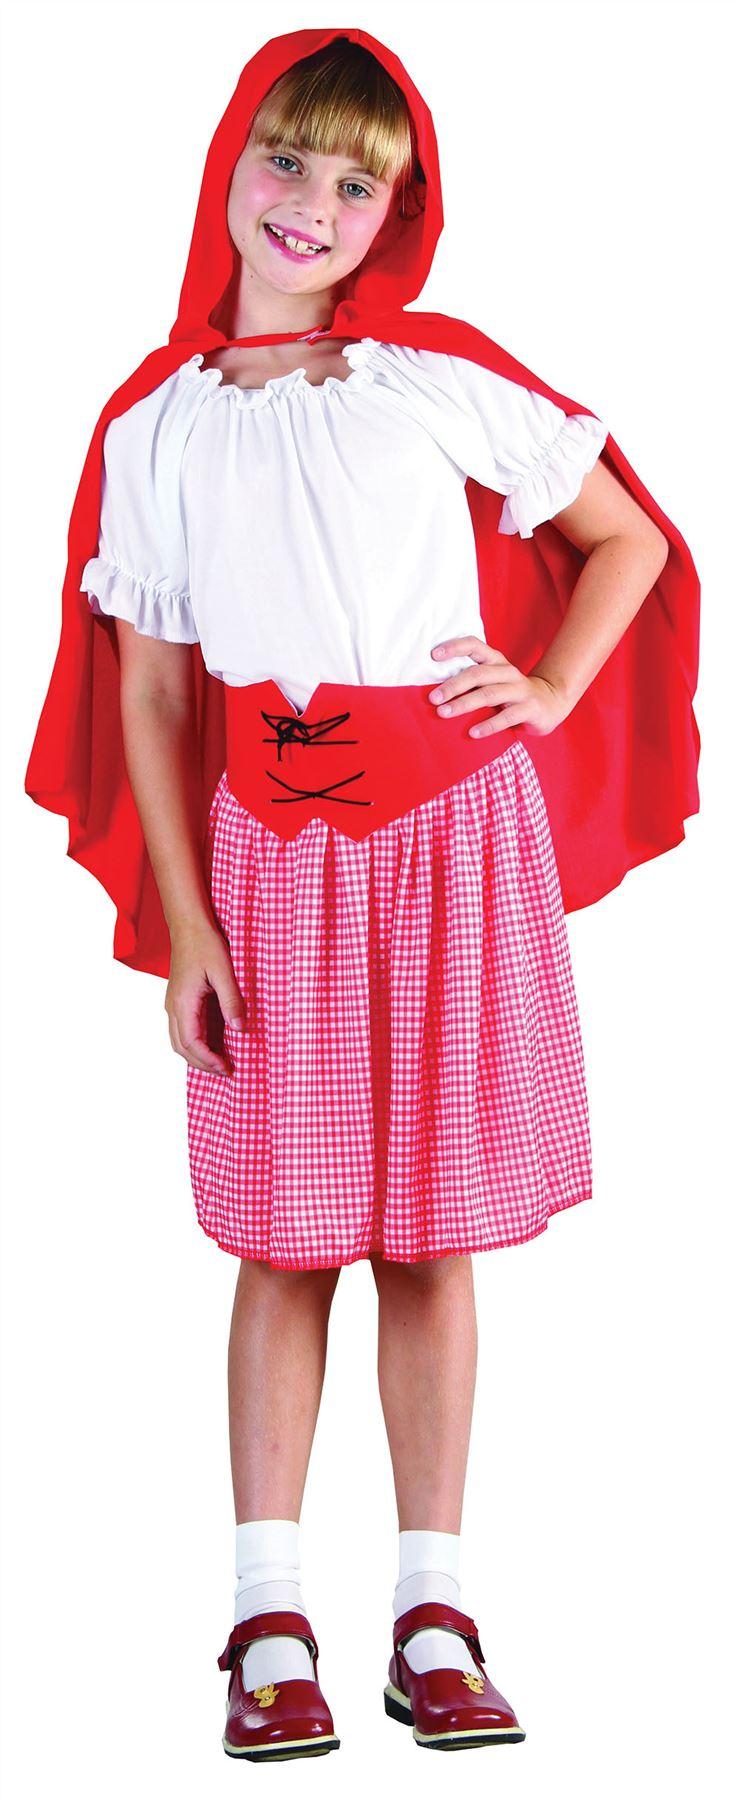 ... -BOOK-WEEK-LITTLE-RED-RIDING-HOOD-FANCY-DRESS-COSTUME-WORLD-BOOK-DAY